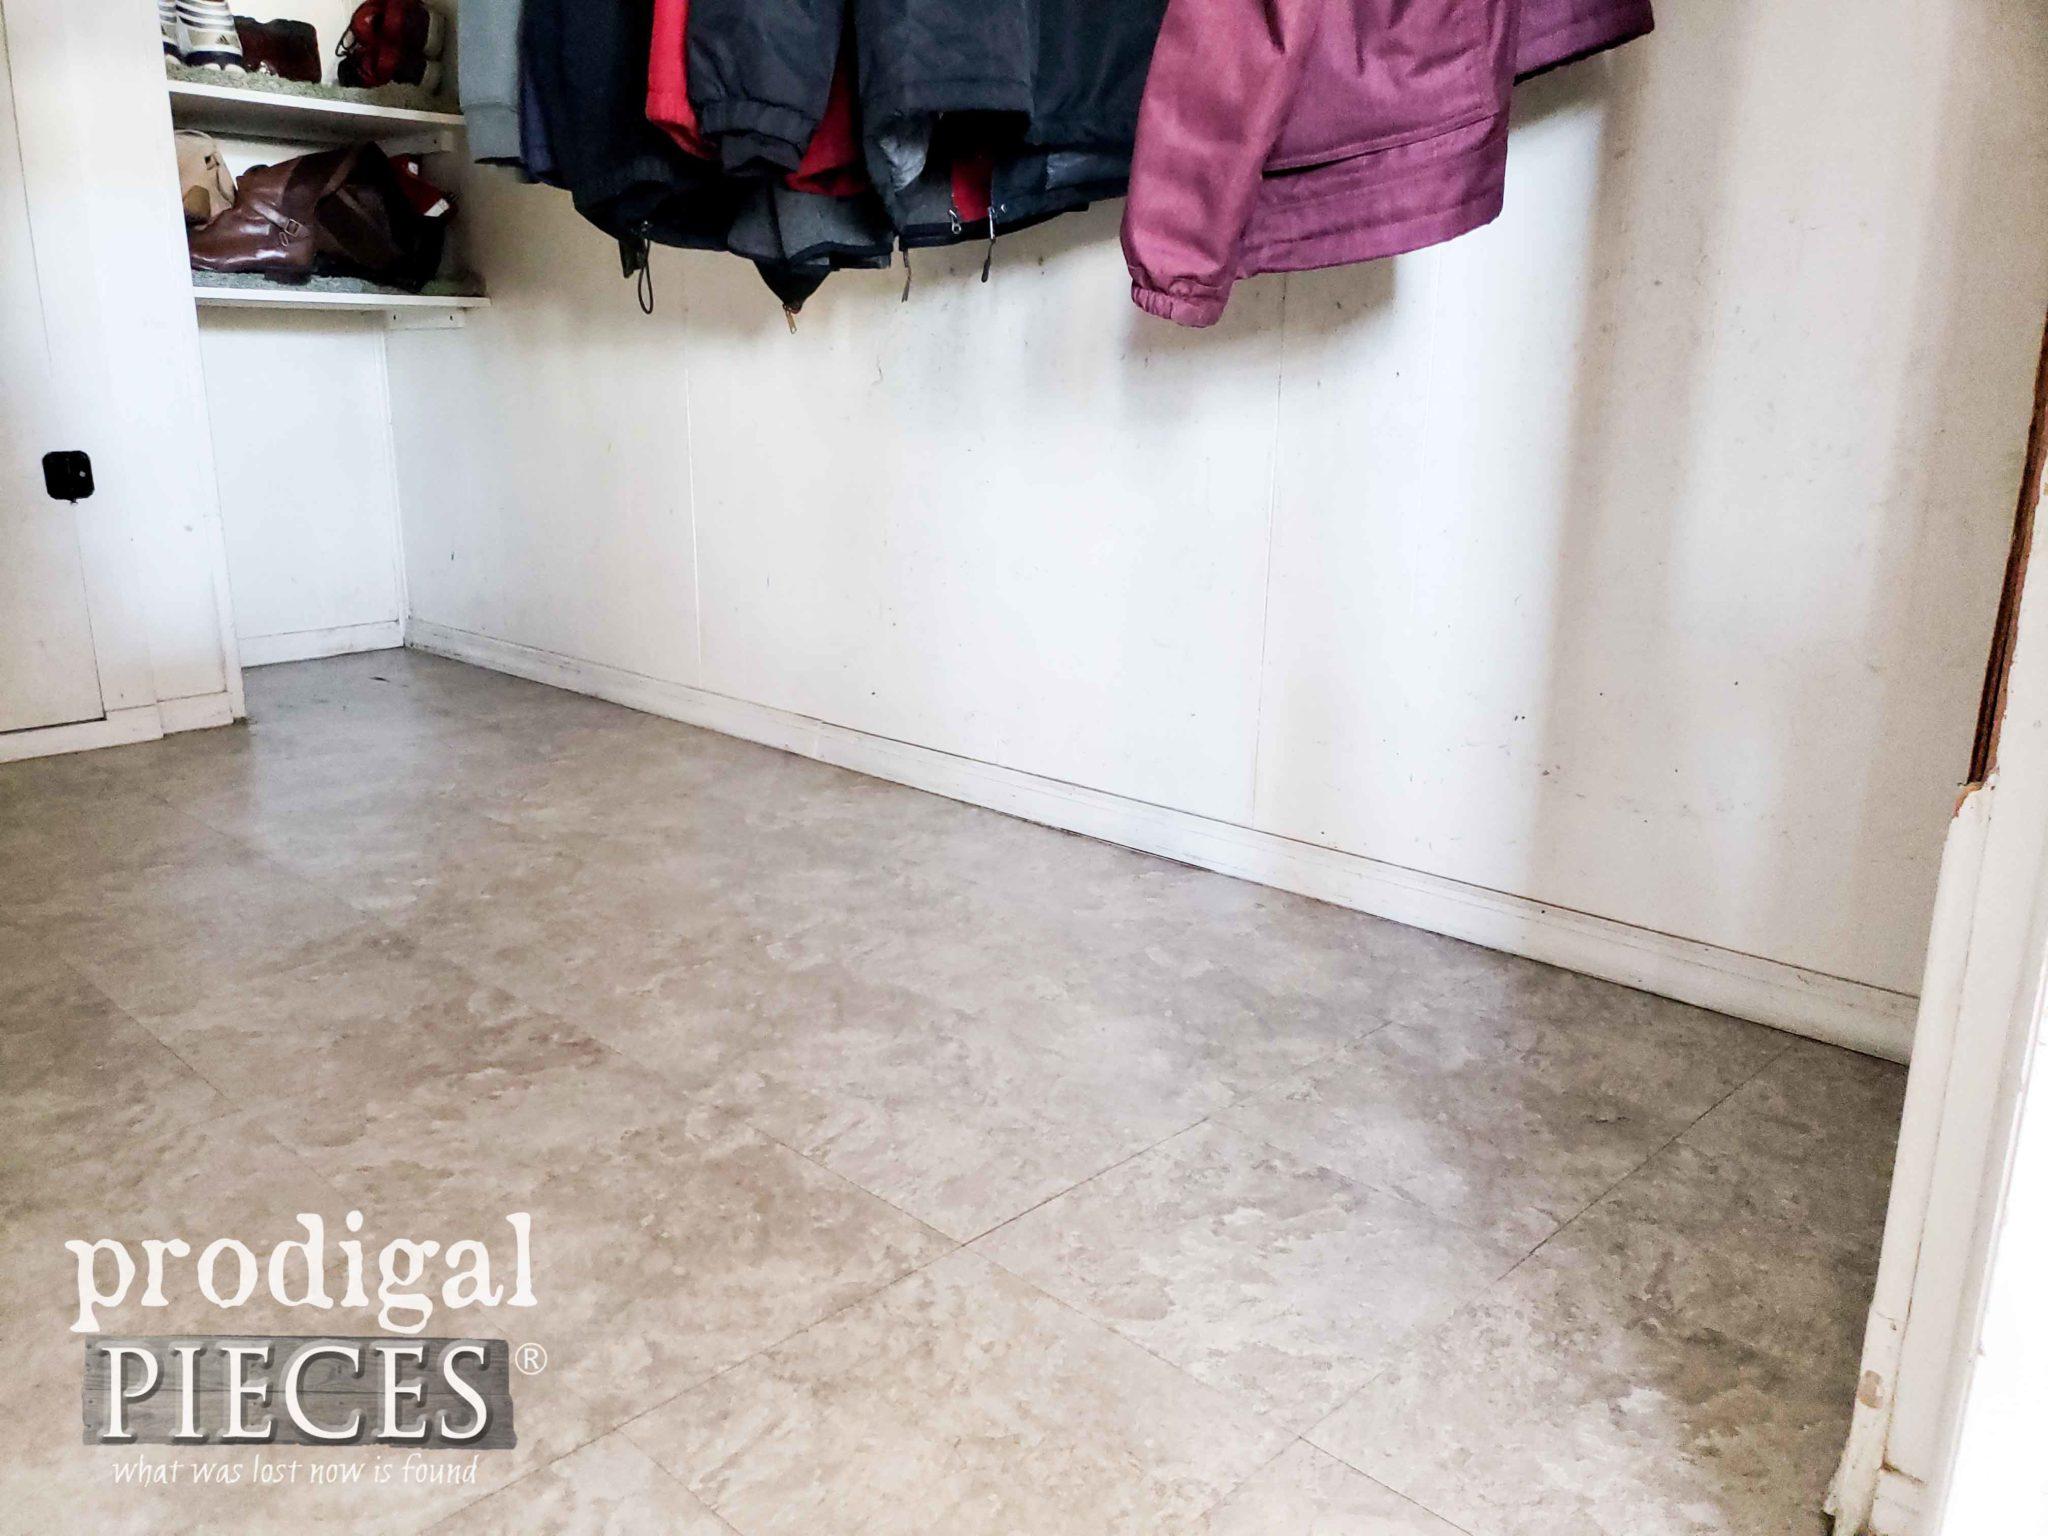 DIY Shoe Storage Before by Prodigal Pieces | prodigalpieces.com